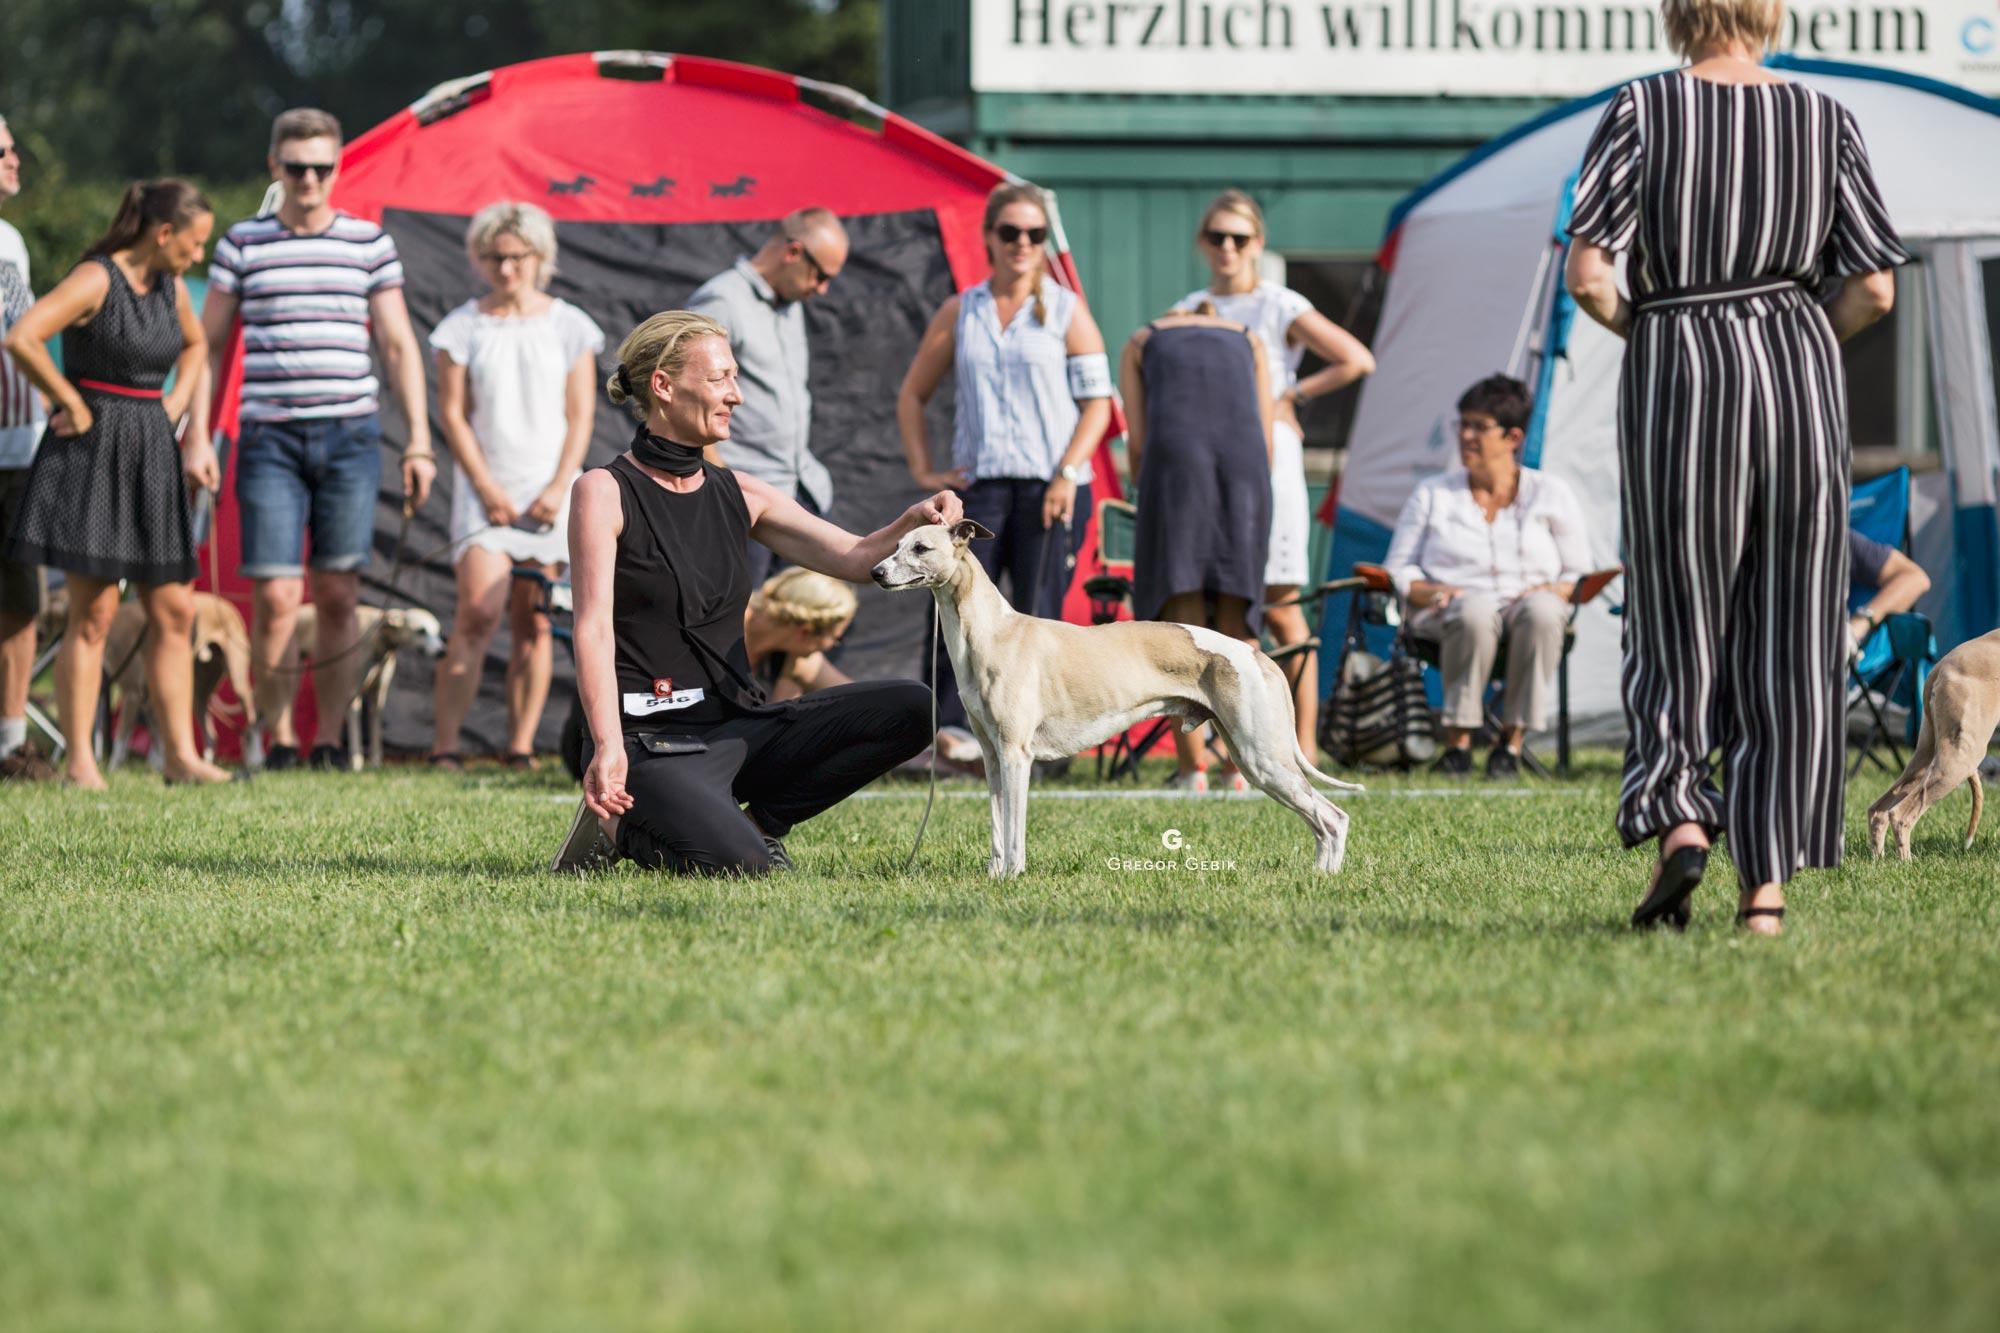 Mono, Conte del Aqua semper-crescendo beim Sighthound Festival Donaueschingen 2018, Foto: Grzegorz Gebik 2018